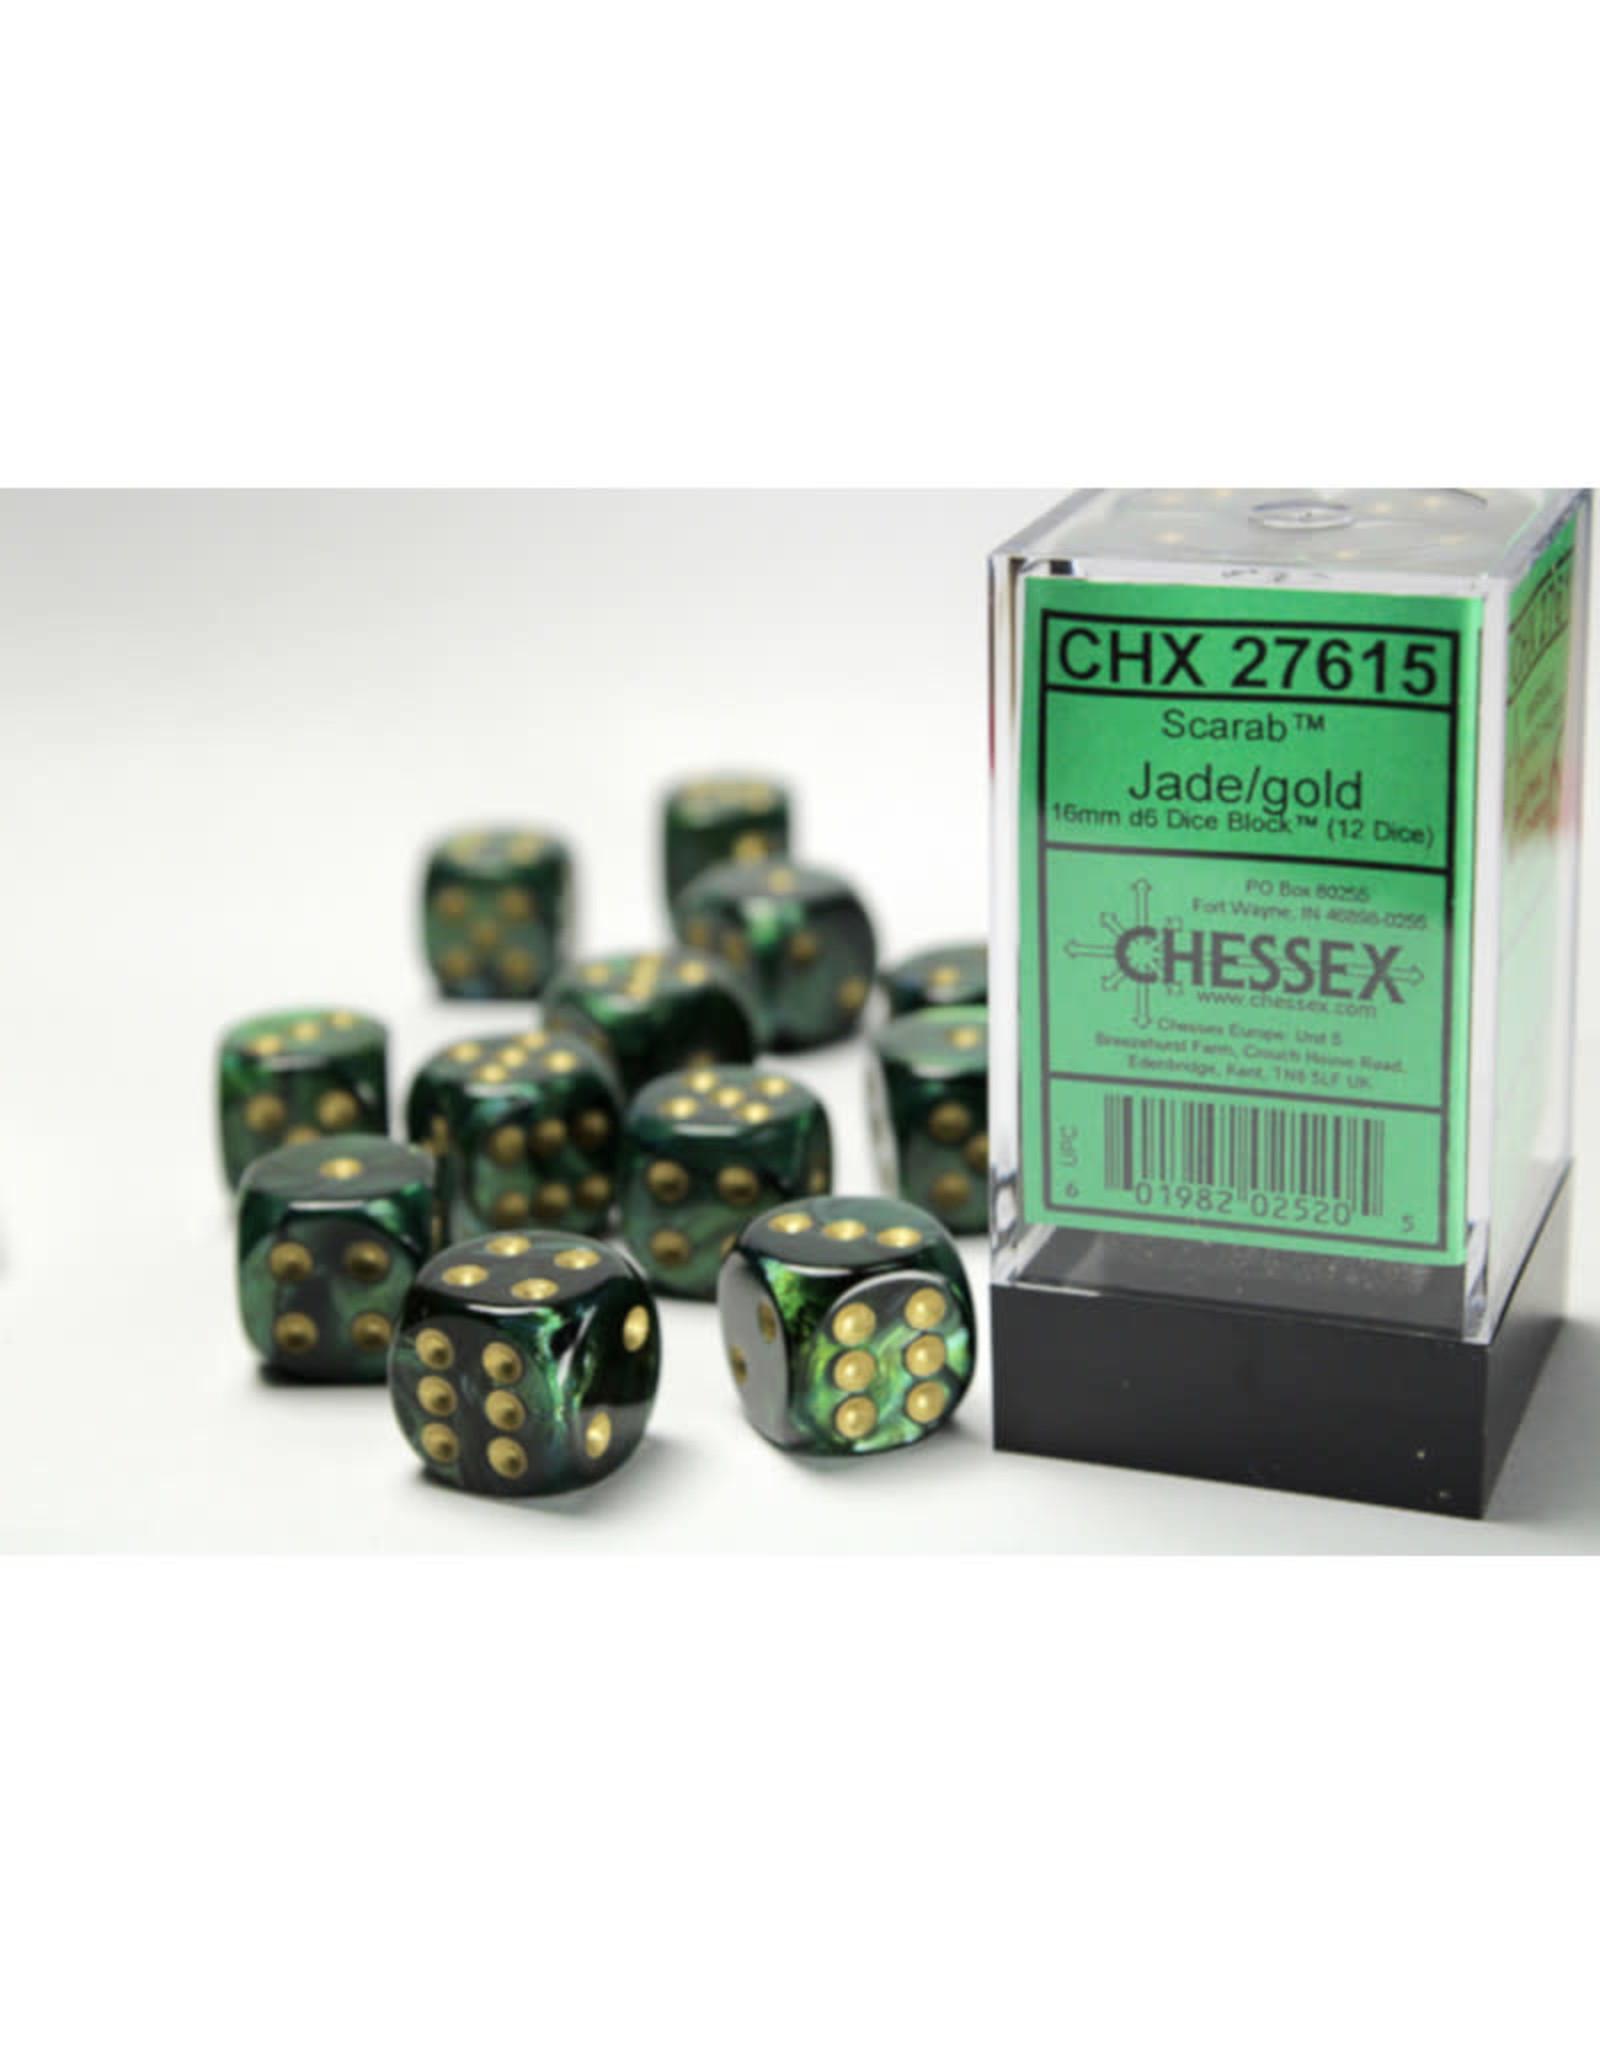 Chessex D6 Dice: 16mm Scarab Jade/Gold/Black (12)